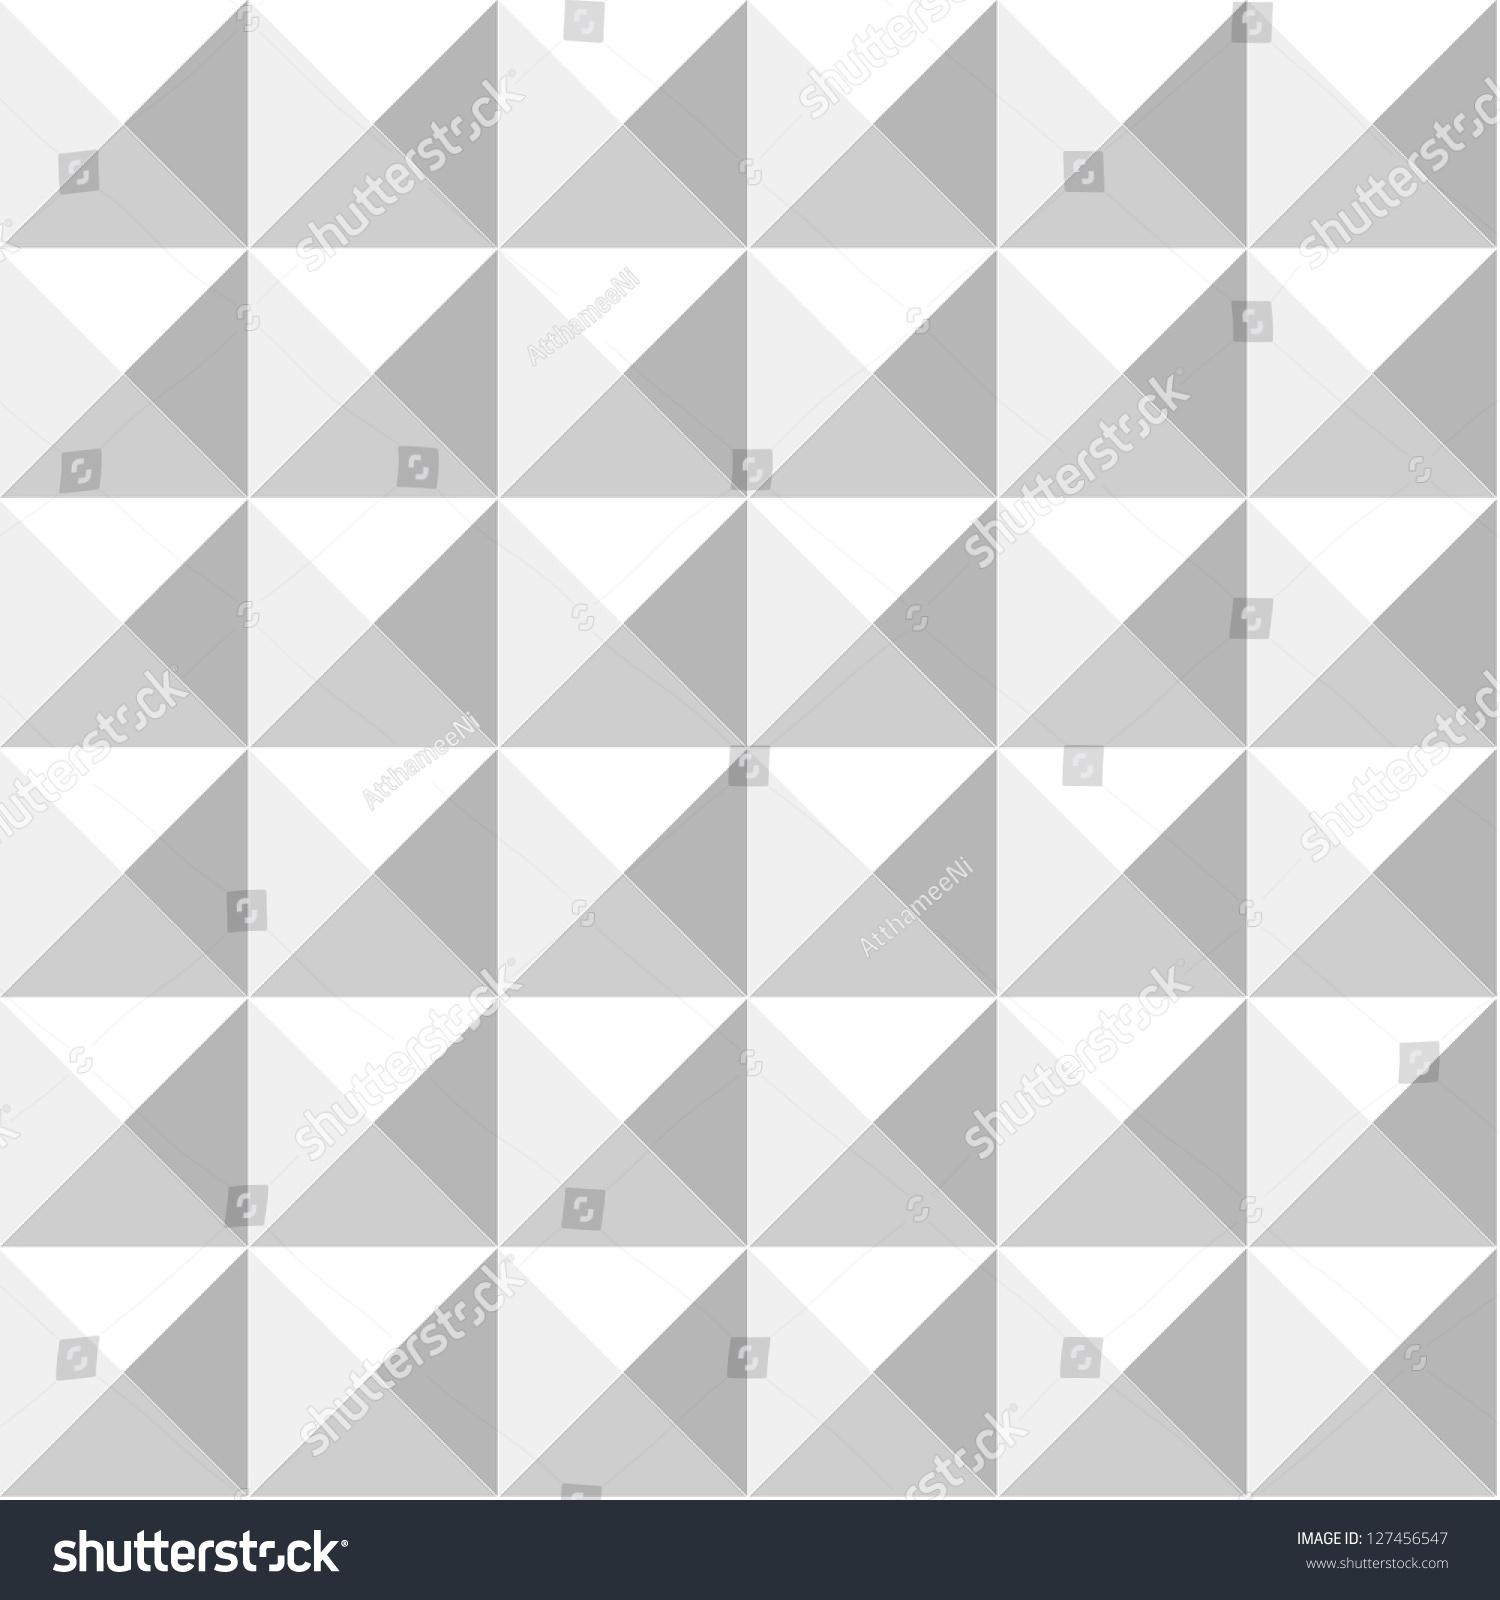 Abstract Graphic Pyramid Pattern Design ภาพประกอบสต็อก 127456547 ...